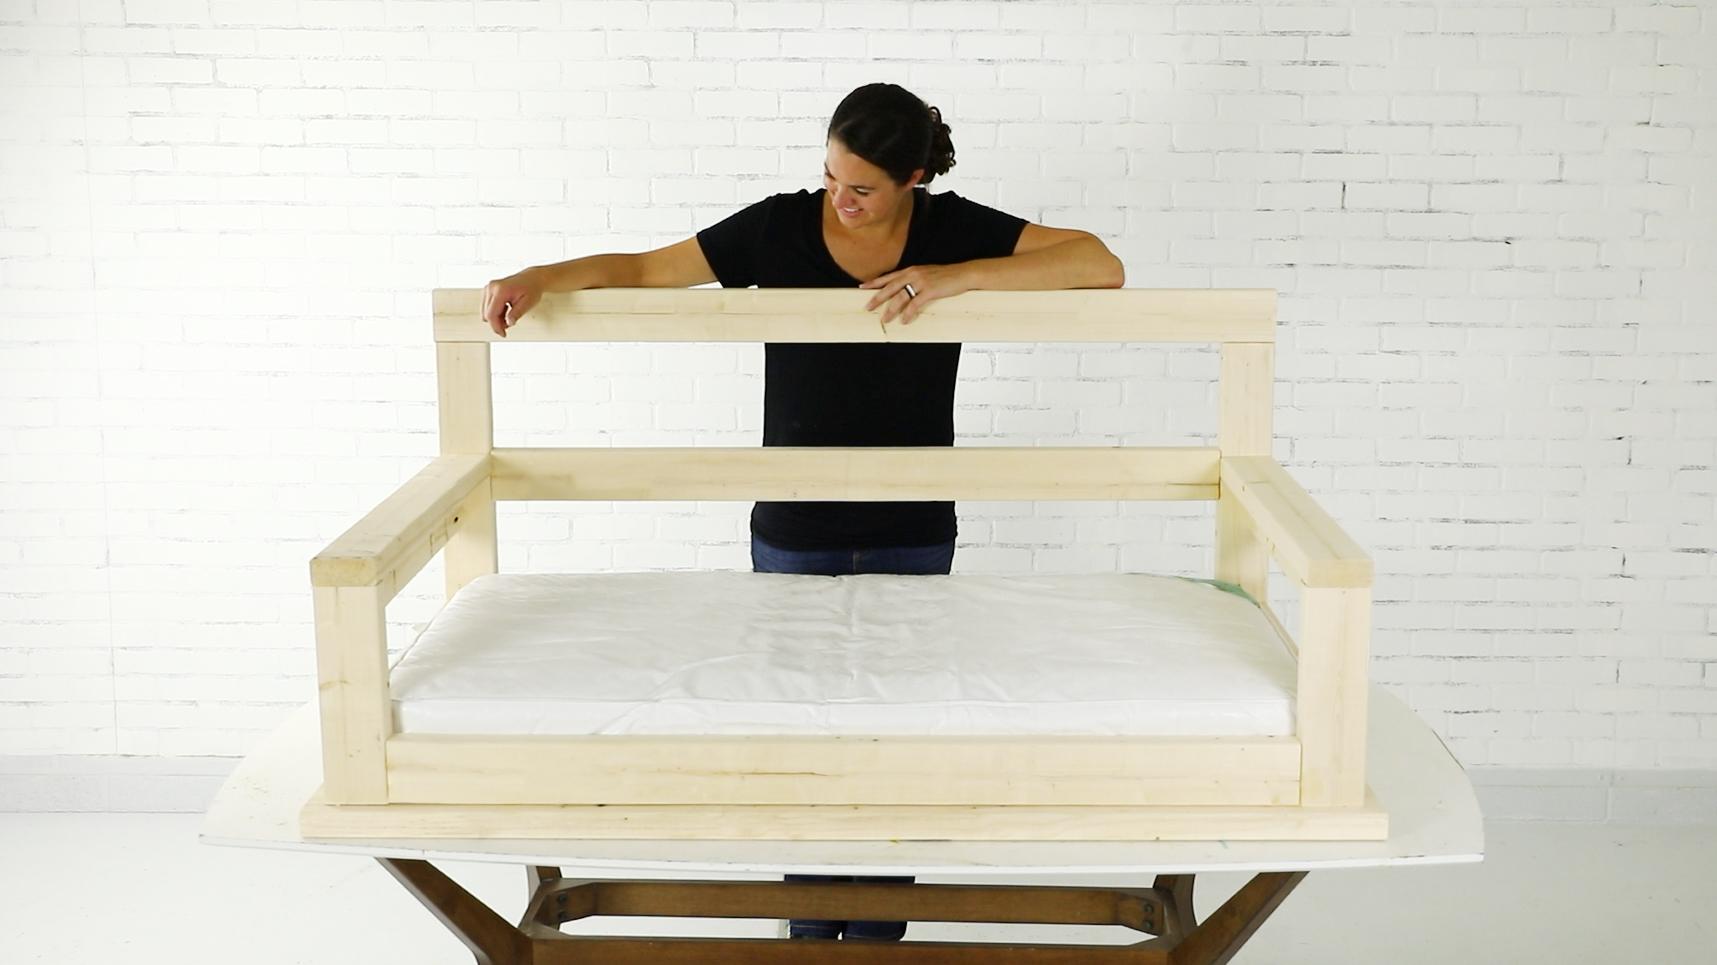 Jenn Largesse builds a porch swing bench